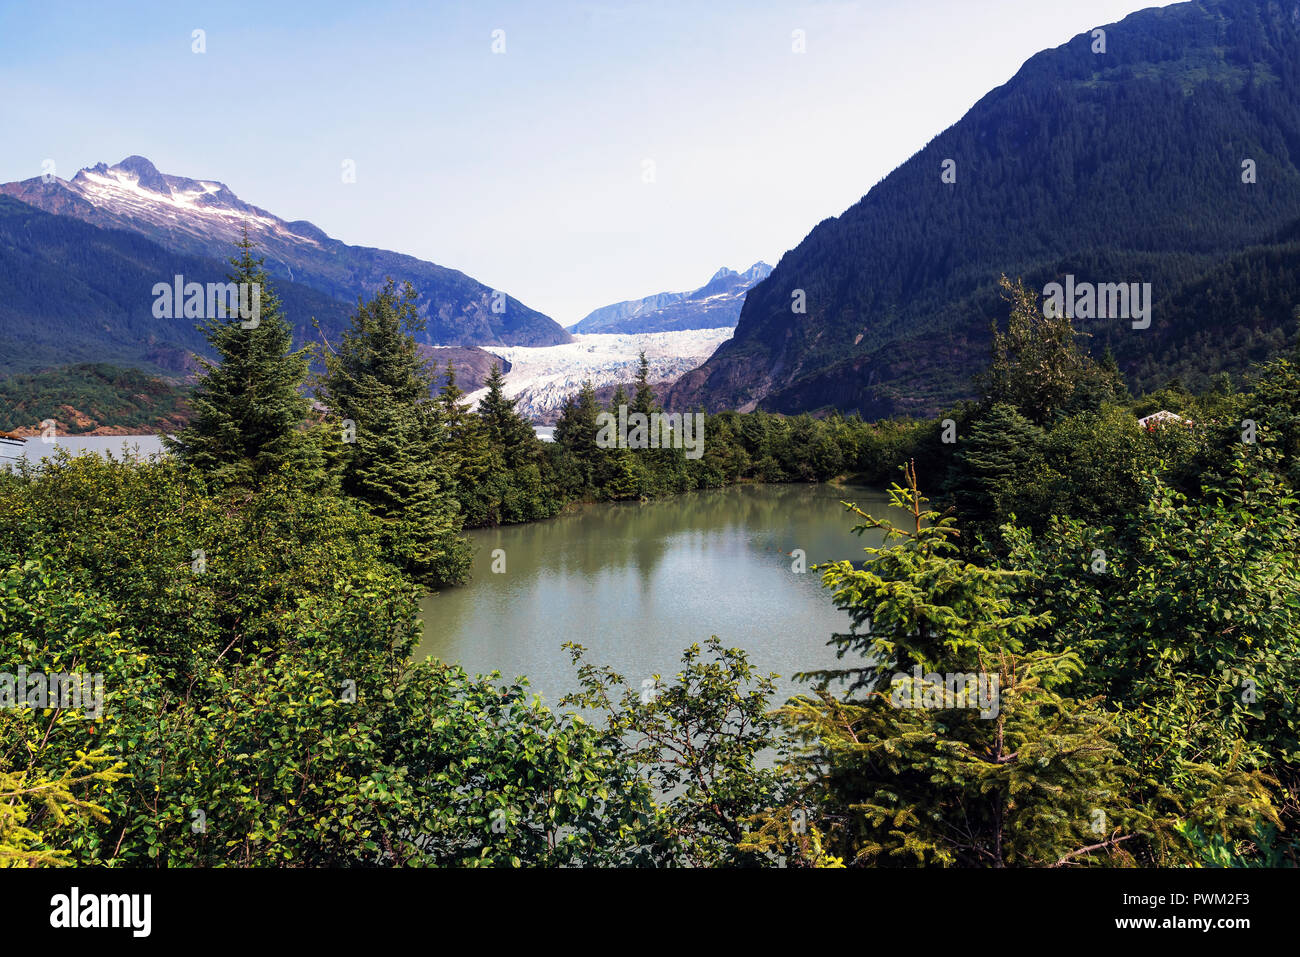 Mendenhall Glacier and Mendenhall Lake, Mendenhall Valley, Alaska, USA - Stock Image